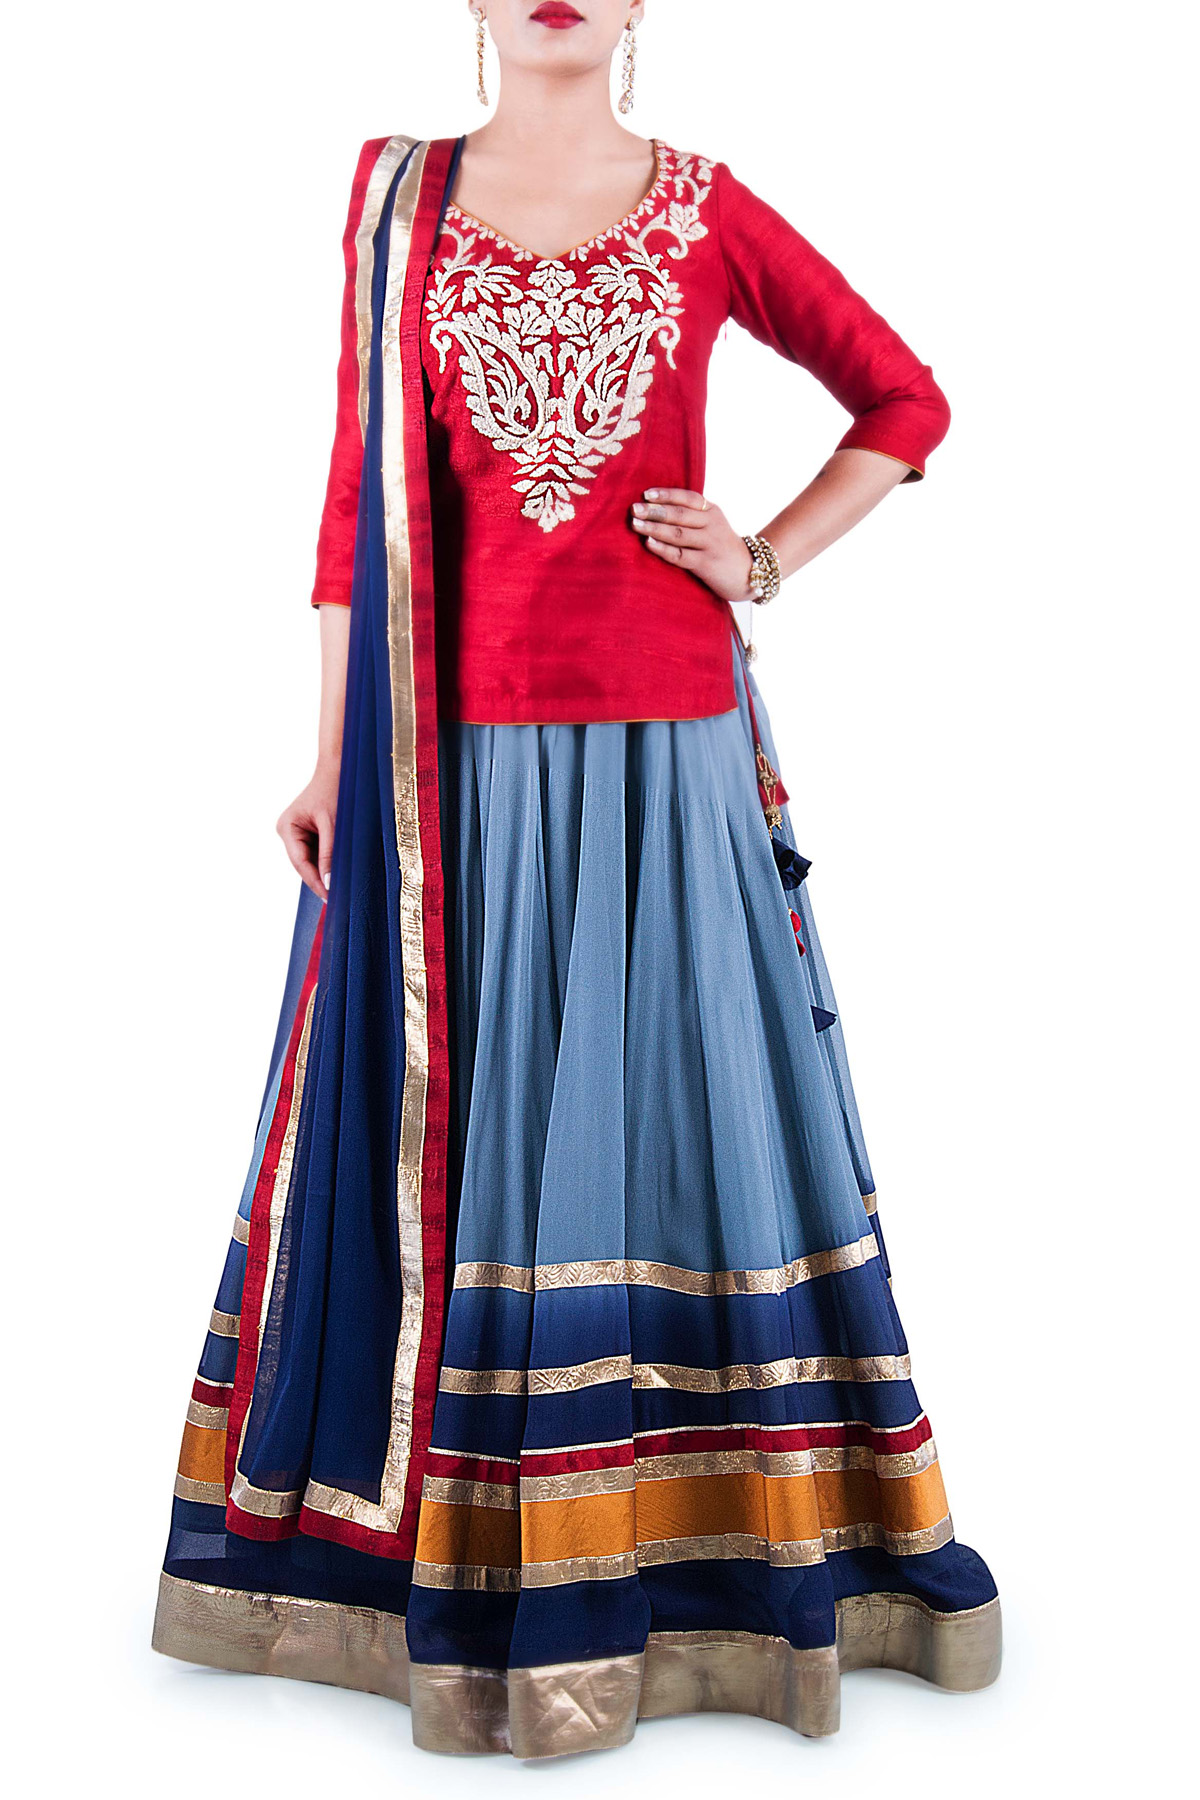 Indian-Bridal-Lehenga-Choli-Designs (2)